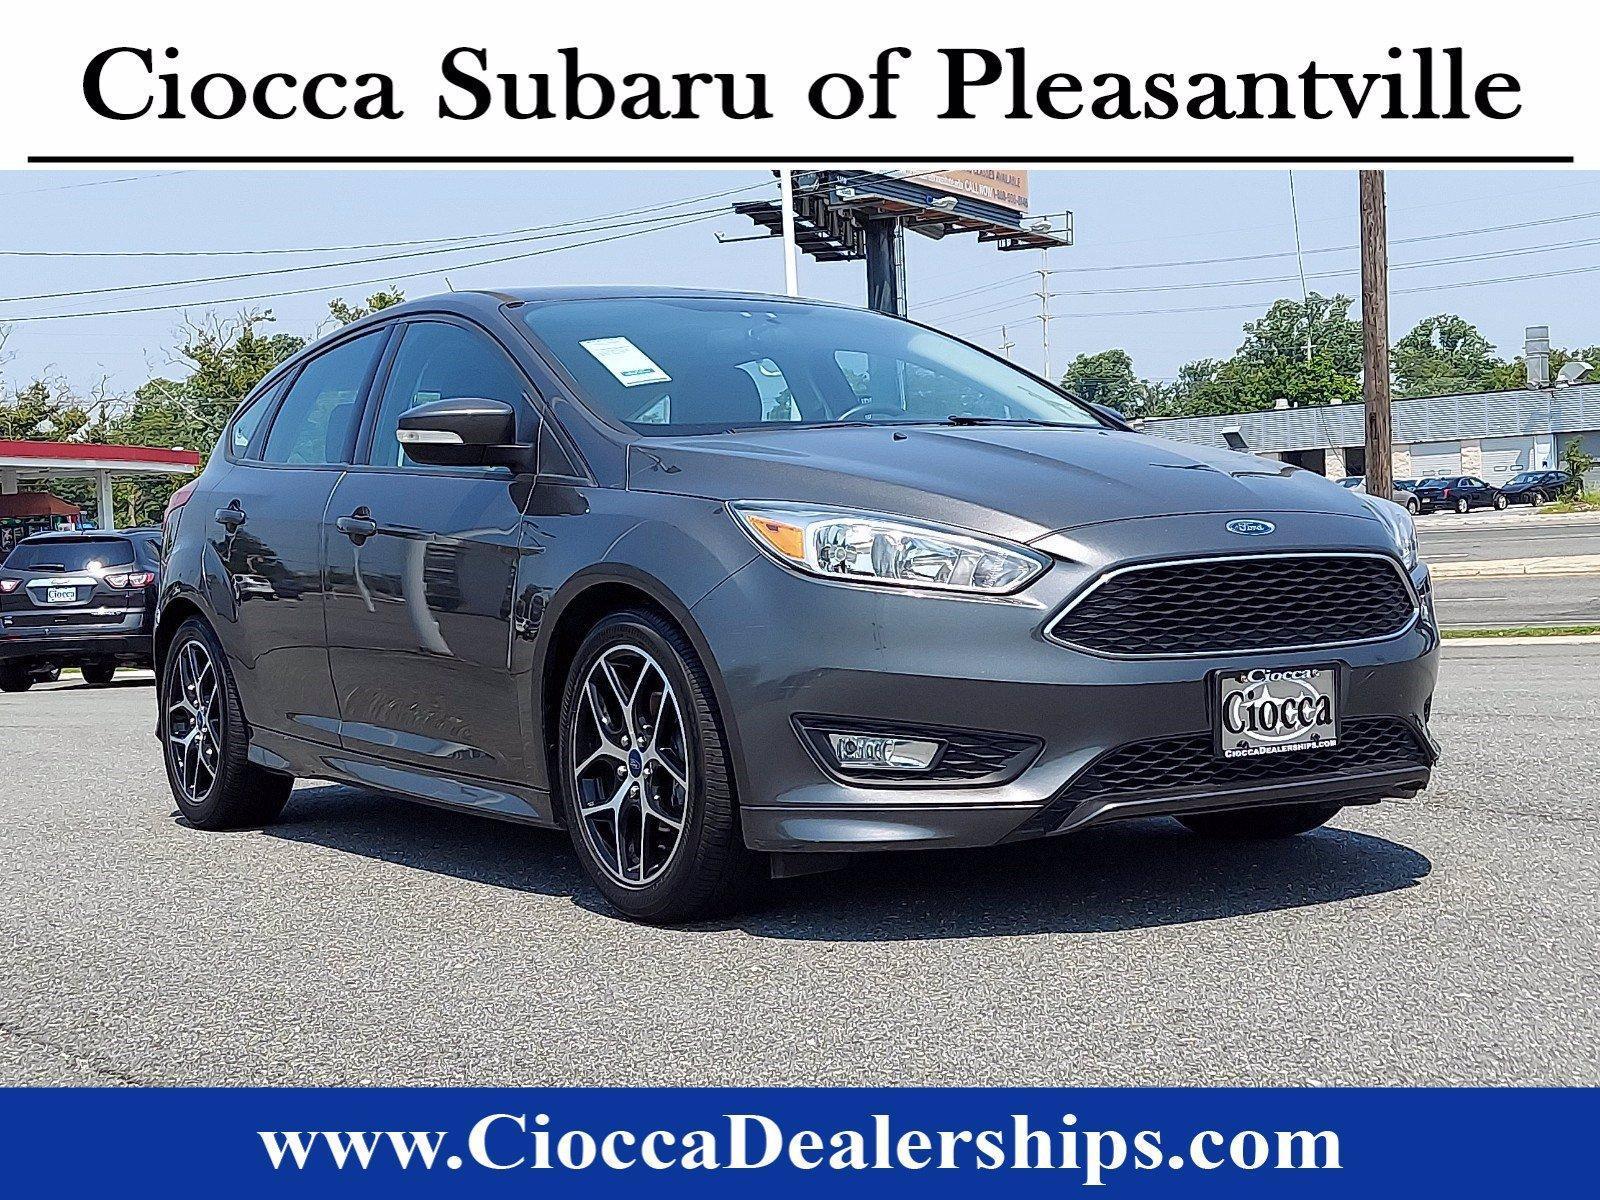 2015 Ford Focus Vehicle Photo in Pleasantville, NJ 08232